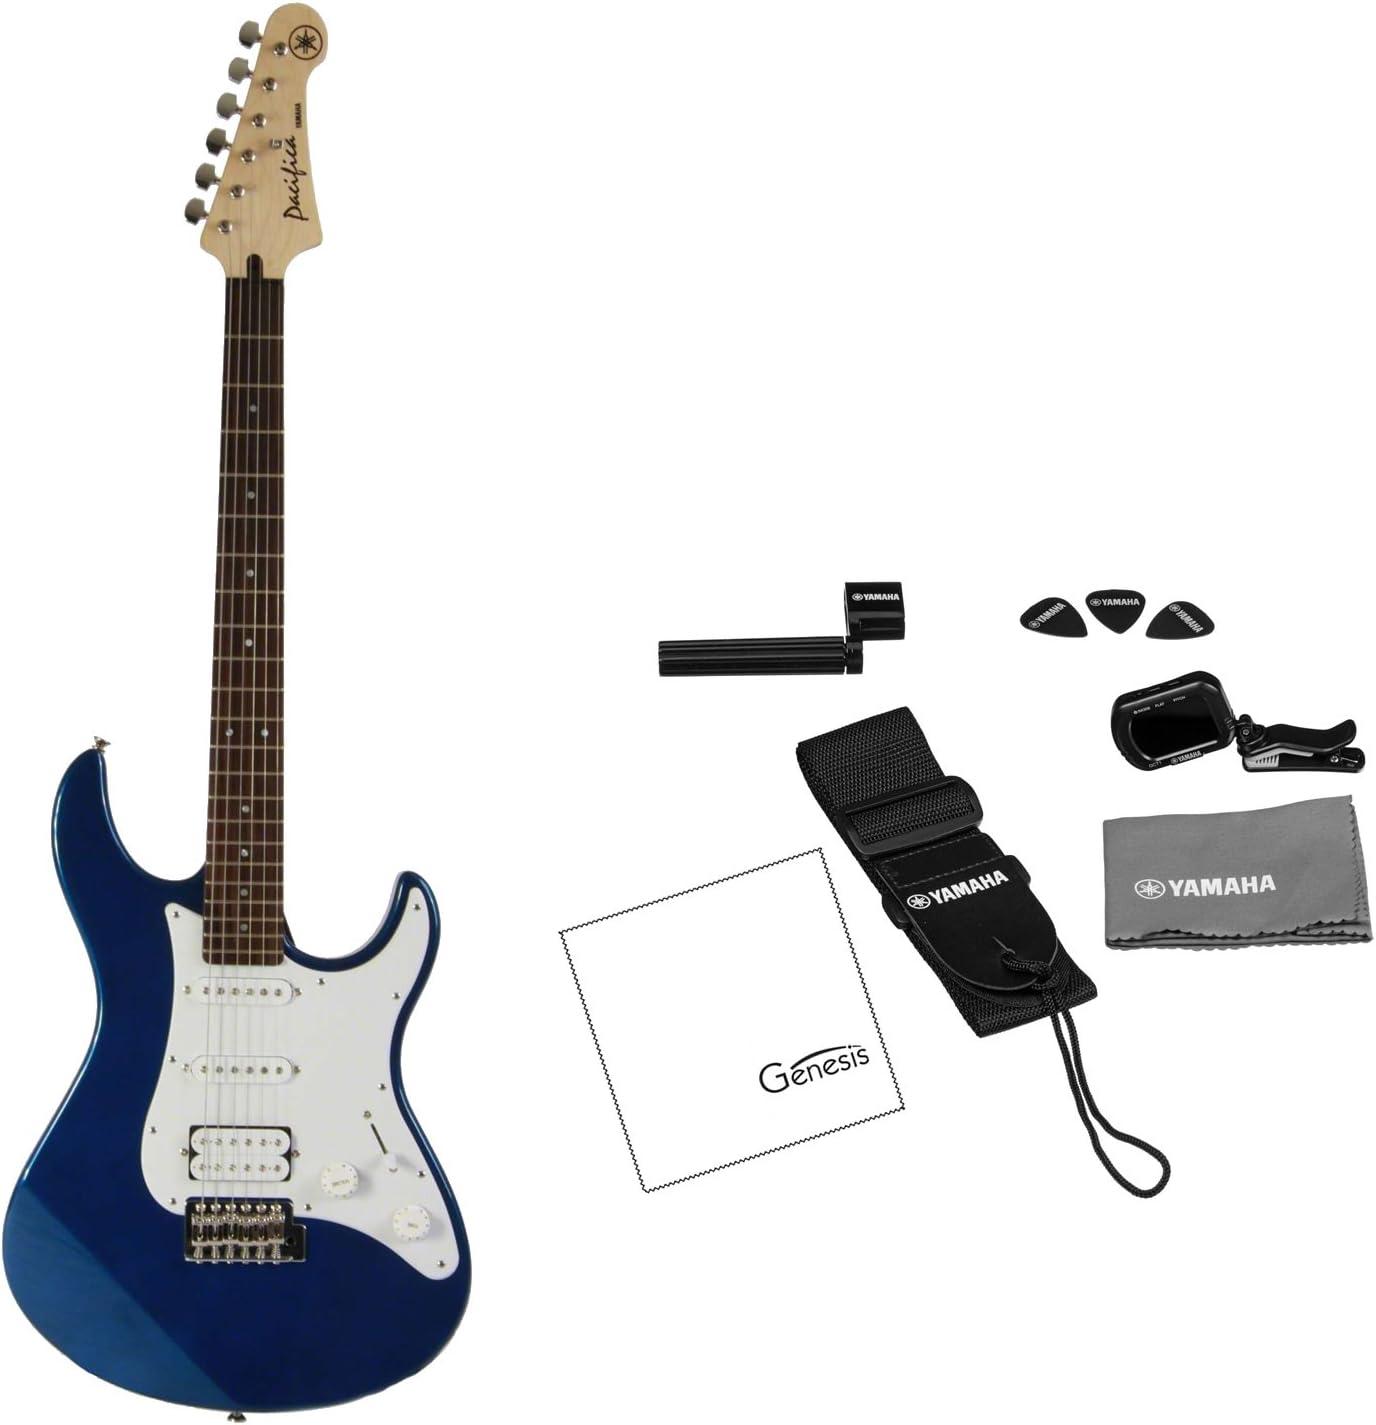 Yamaha Pacifica serie pac012 dBm guitarra eléctrica de profundidad ...